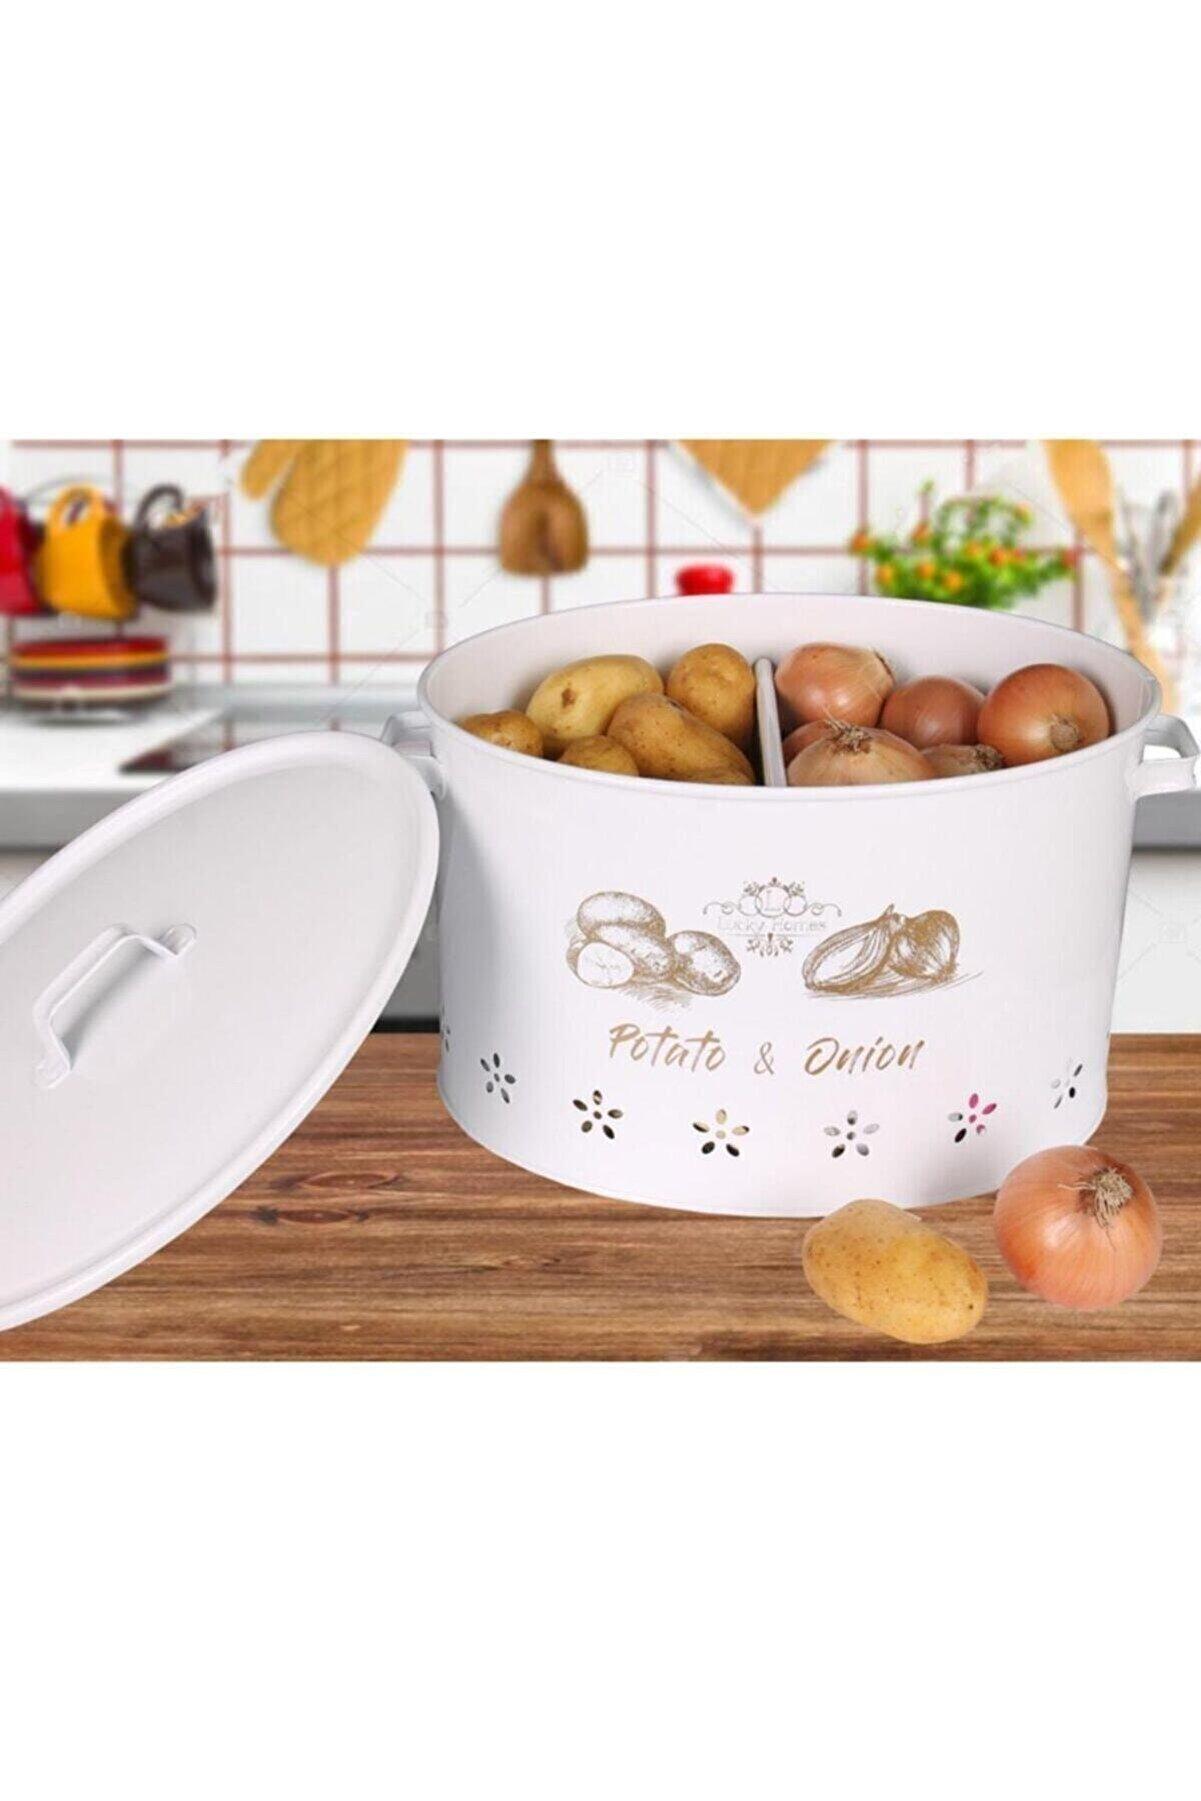 AP STORE 2 Bölmeli Metal Patates Soğan Kovası Beyaz 18 Lt Soğanlık-patates-beyaz